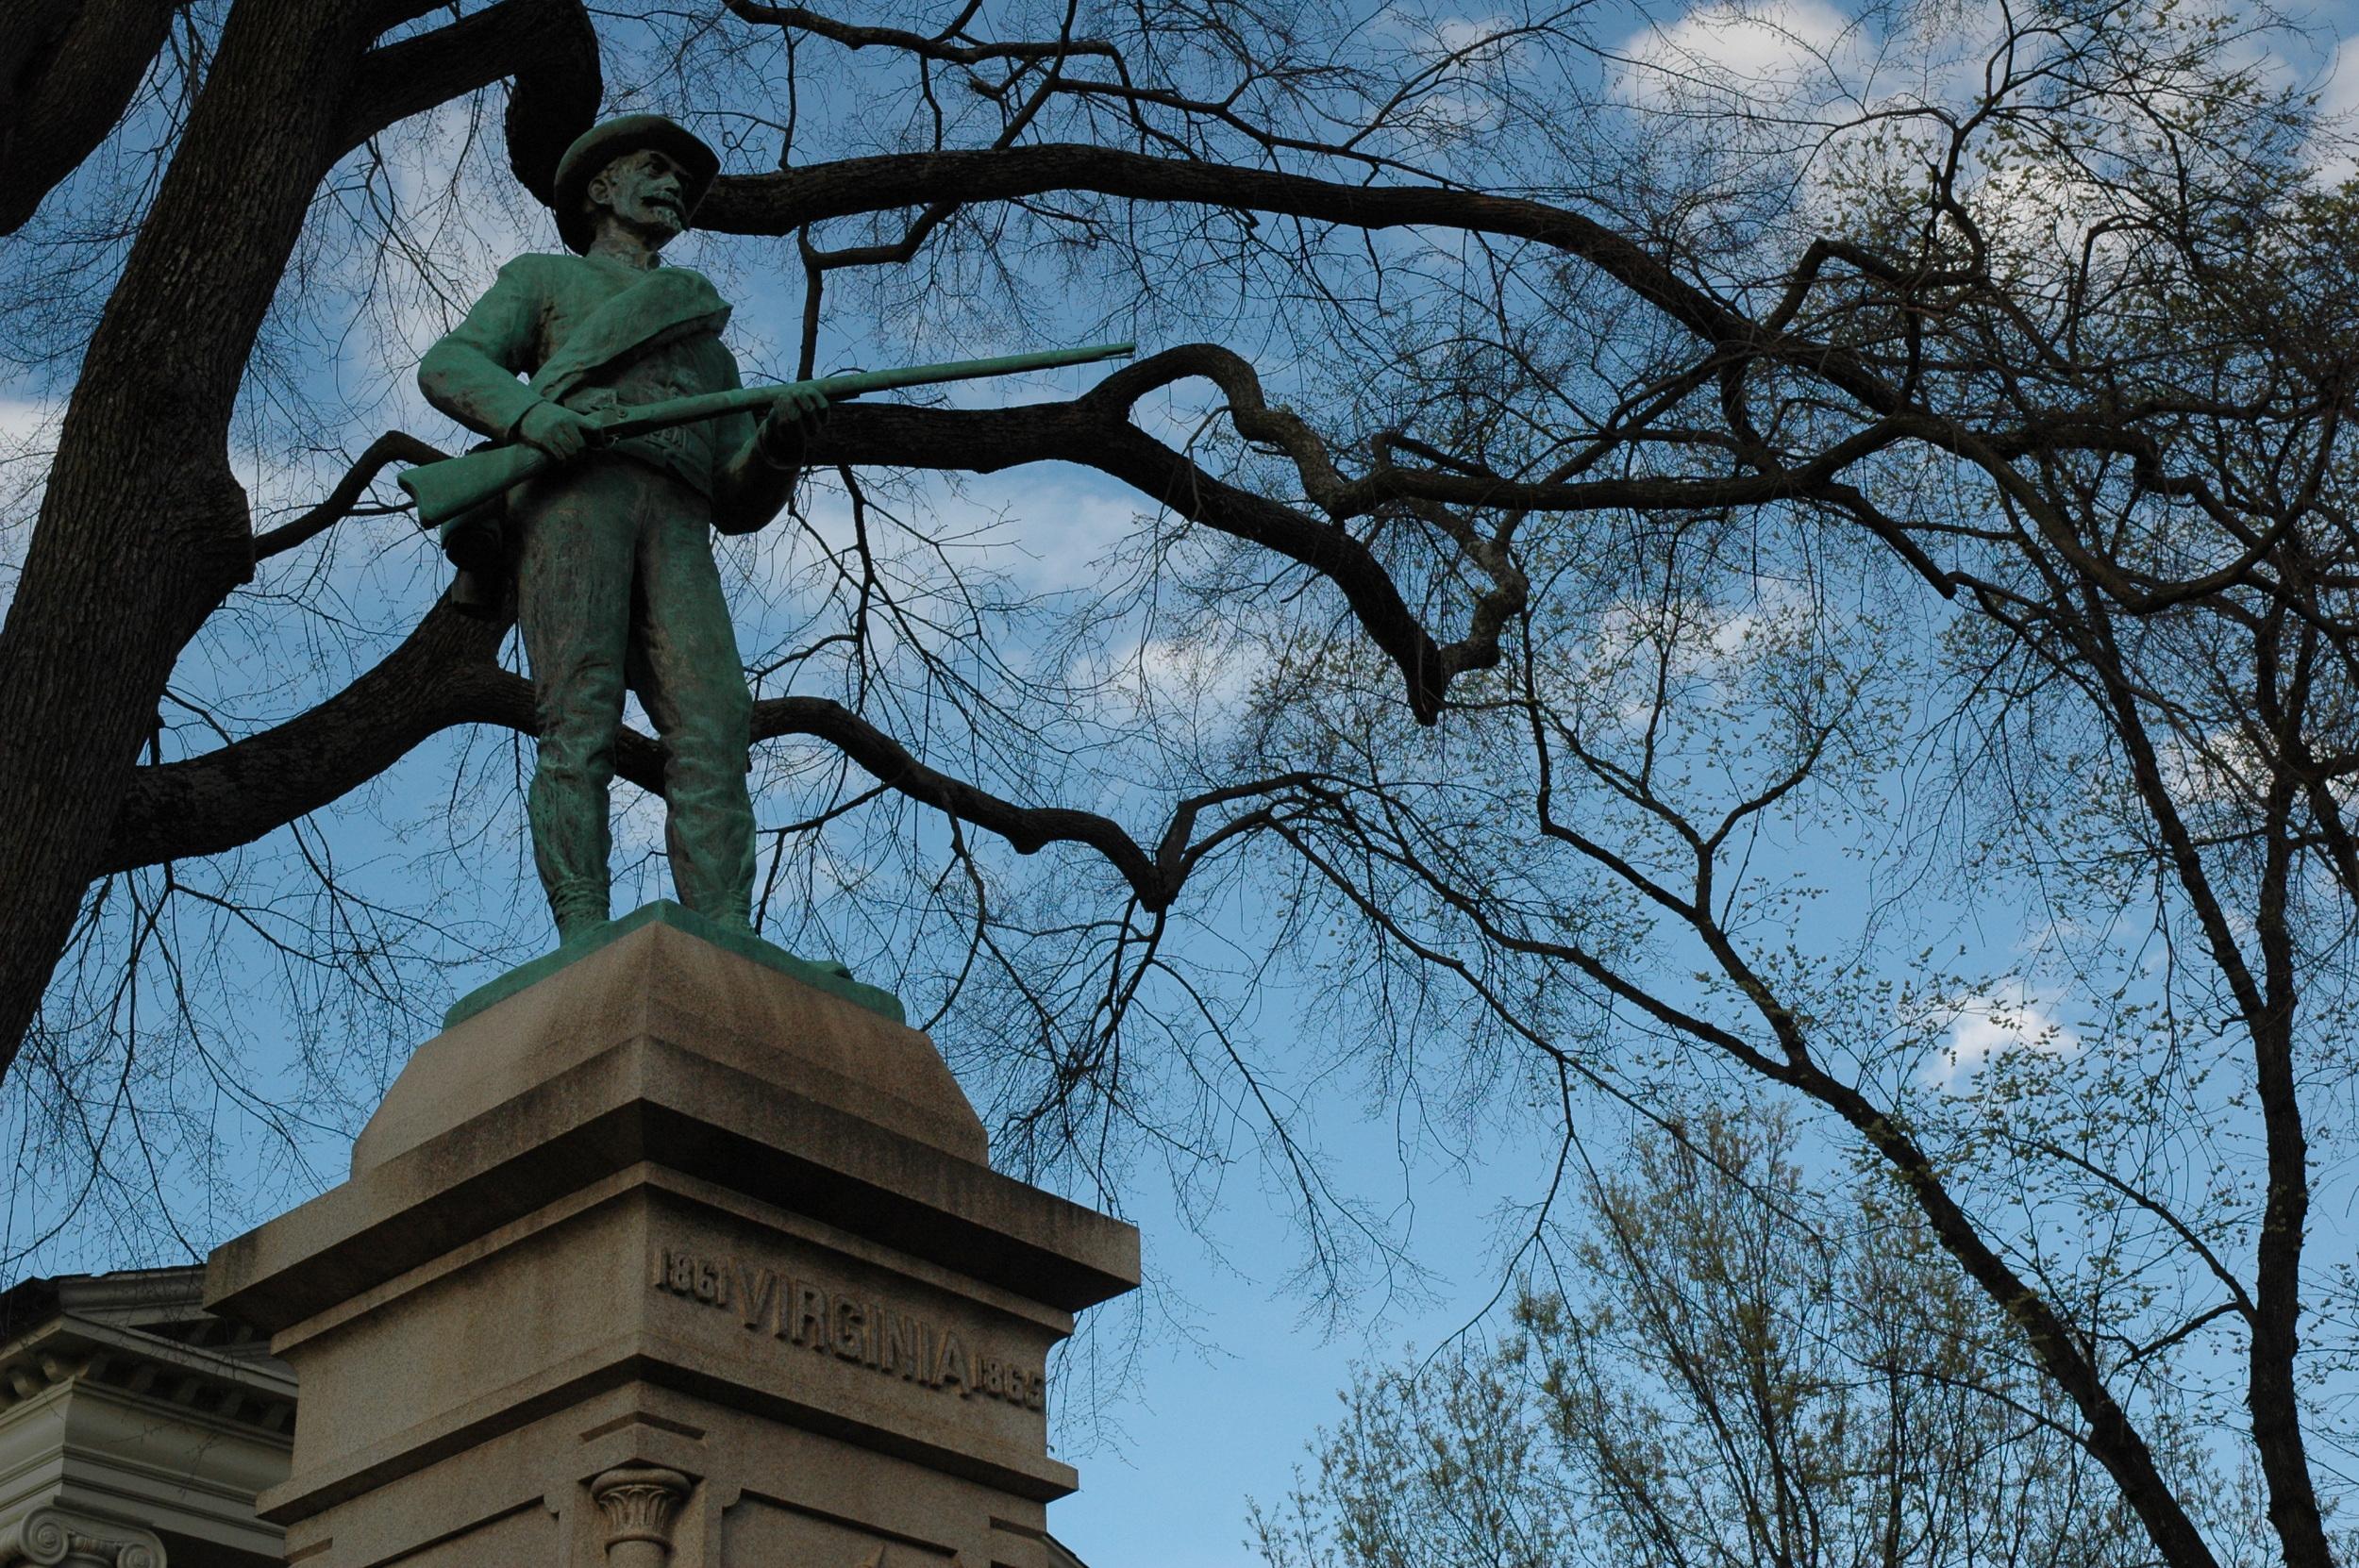 The Virginia Court Square Cville Monument Statue.JPG